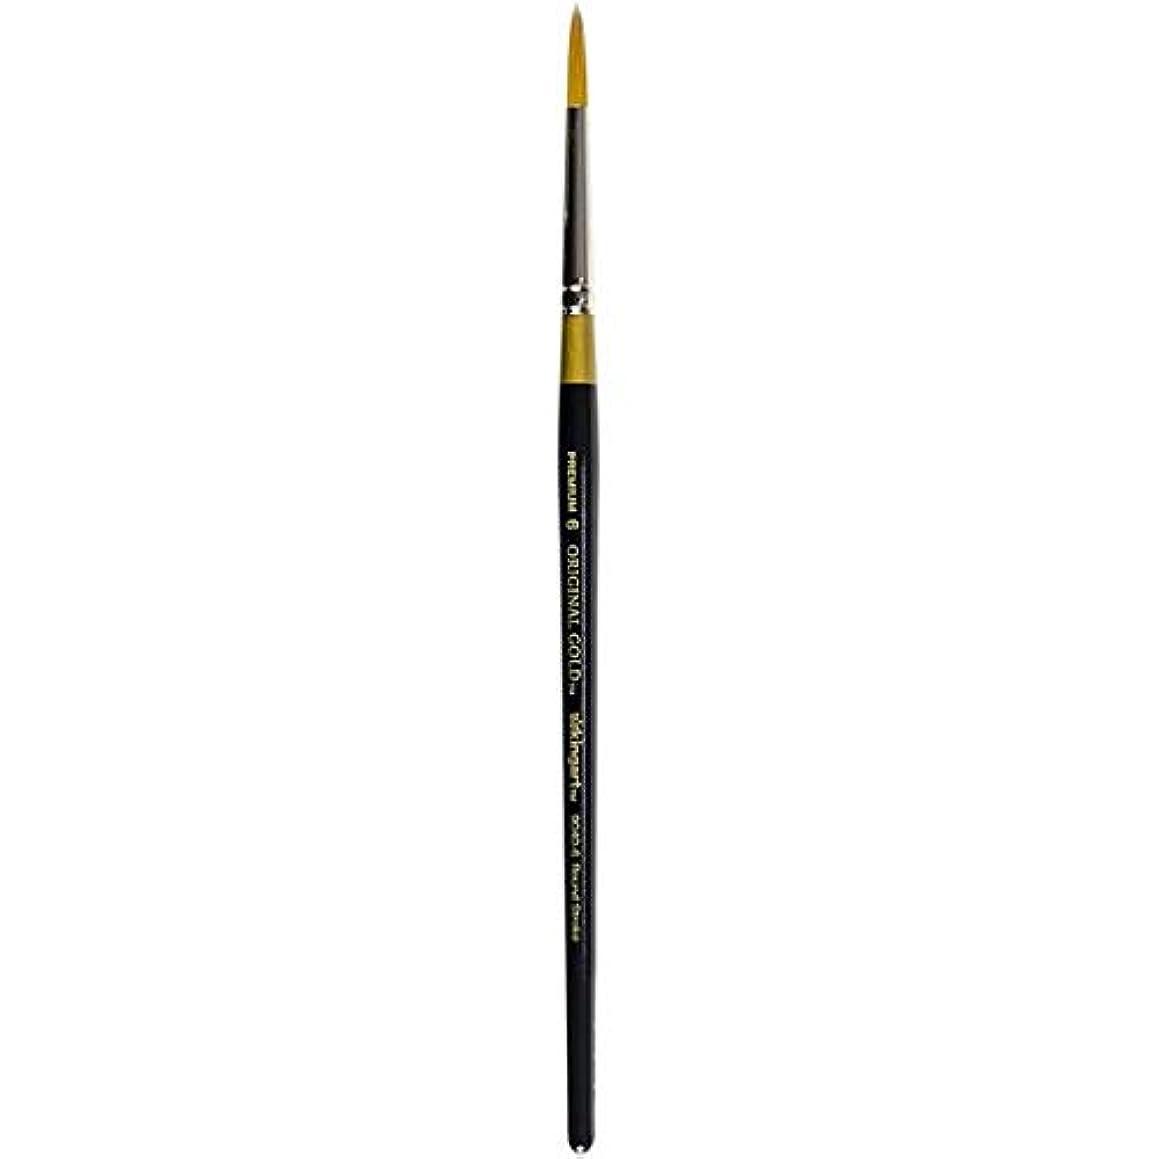 KINGART Original Gold 9040-12, Premium Artist Brush, Golden TAKLON Round Stroke-Size: 12, Black